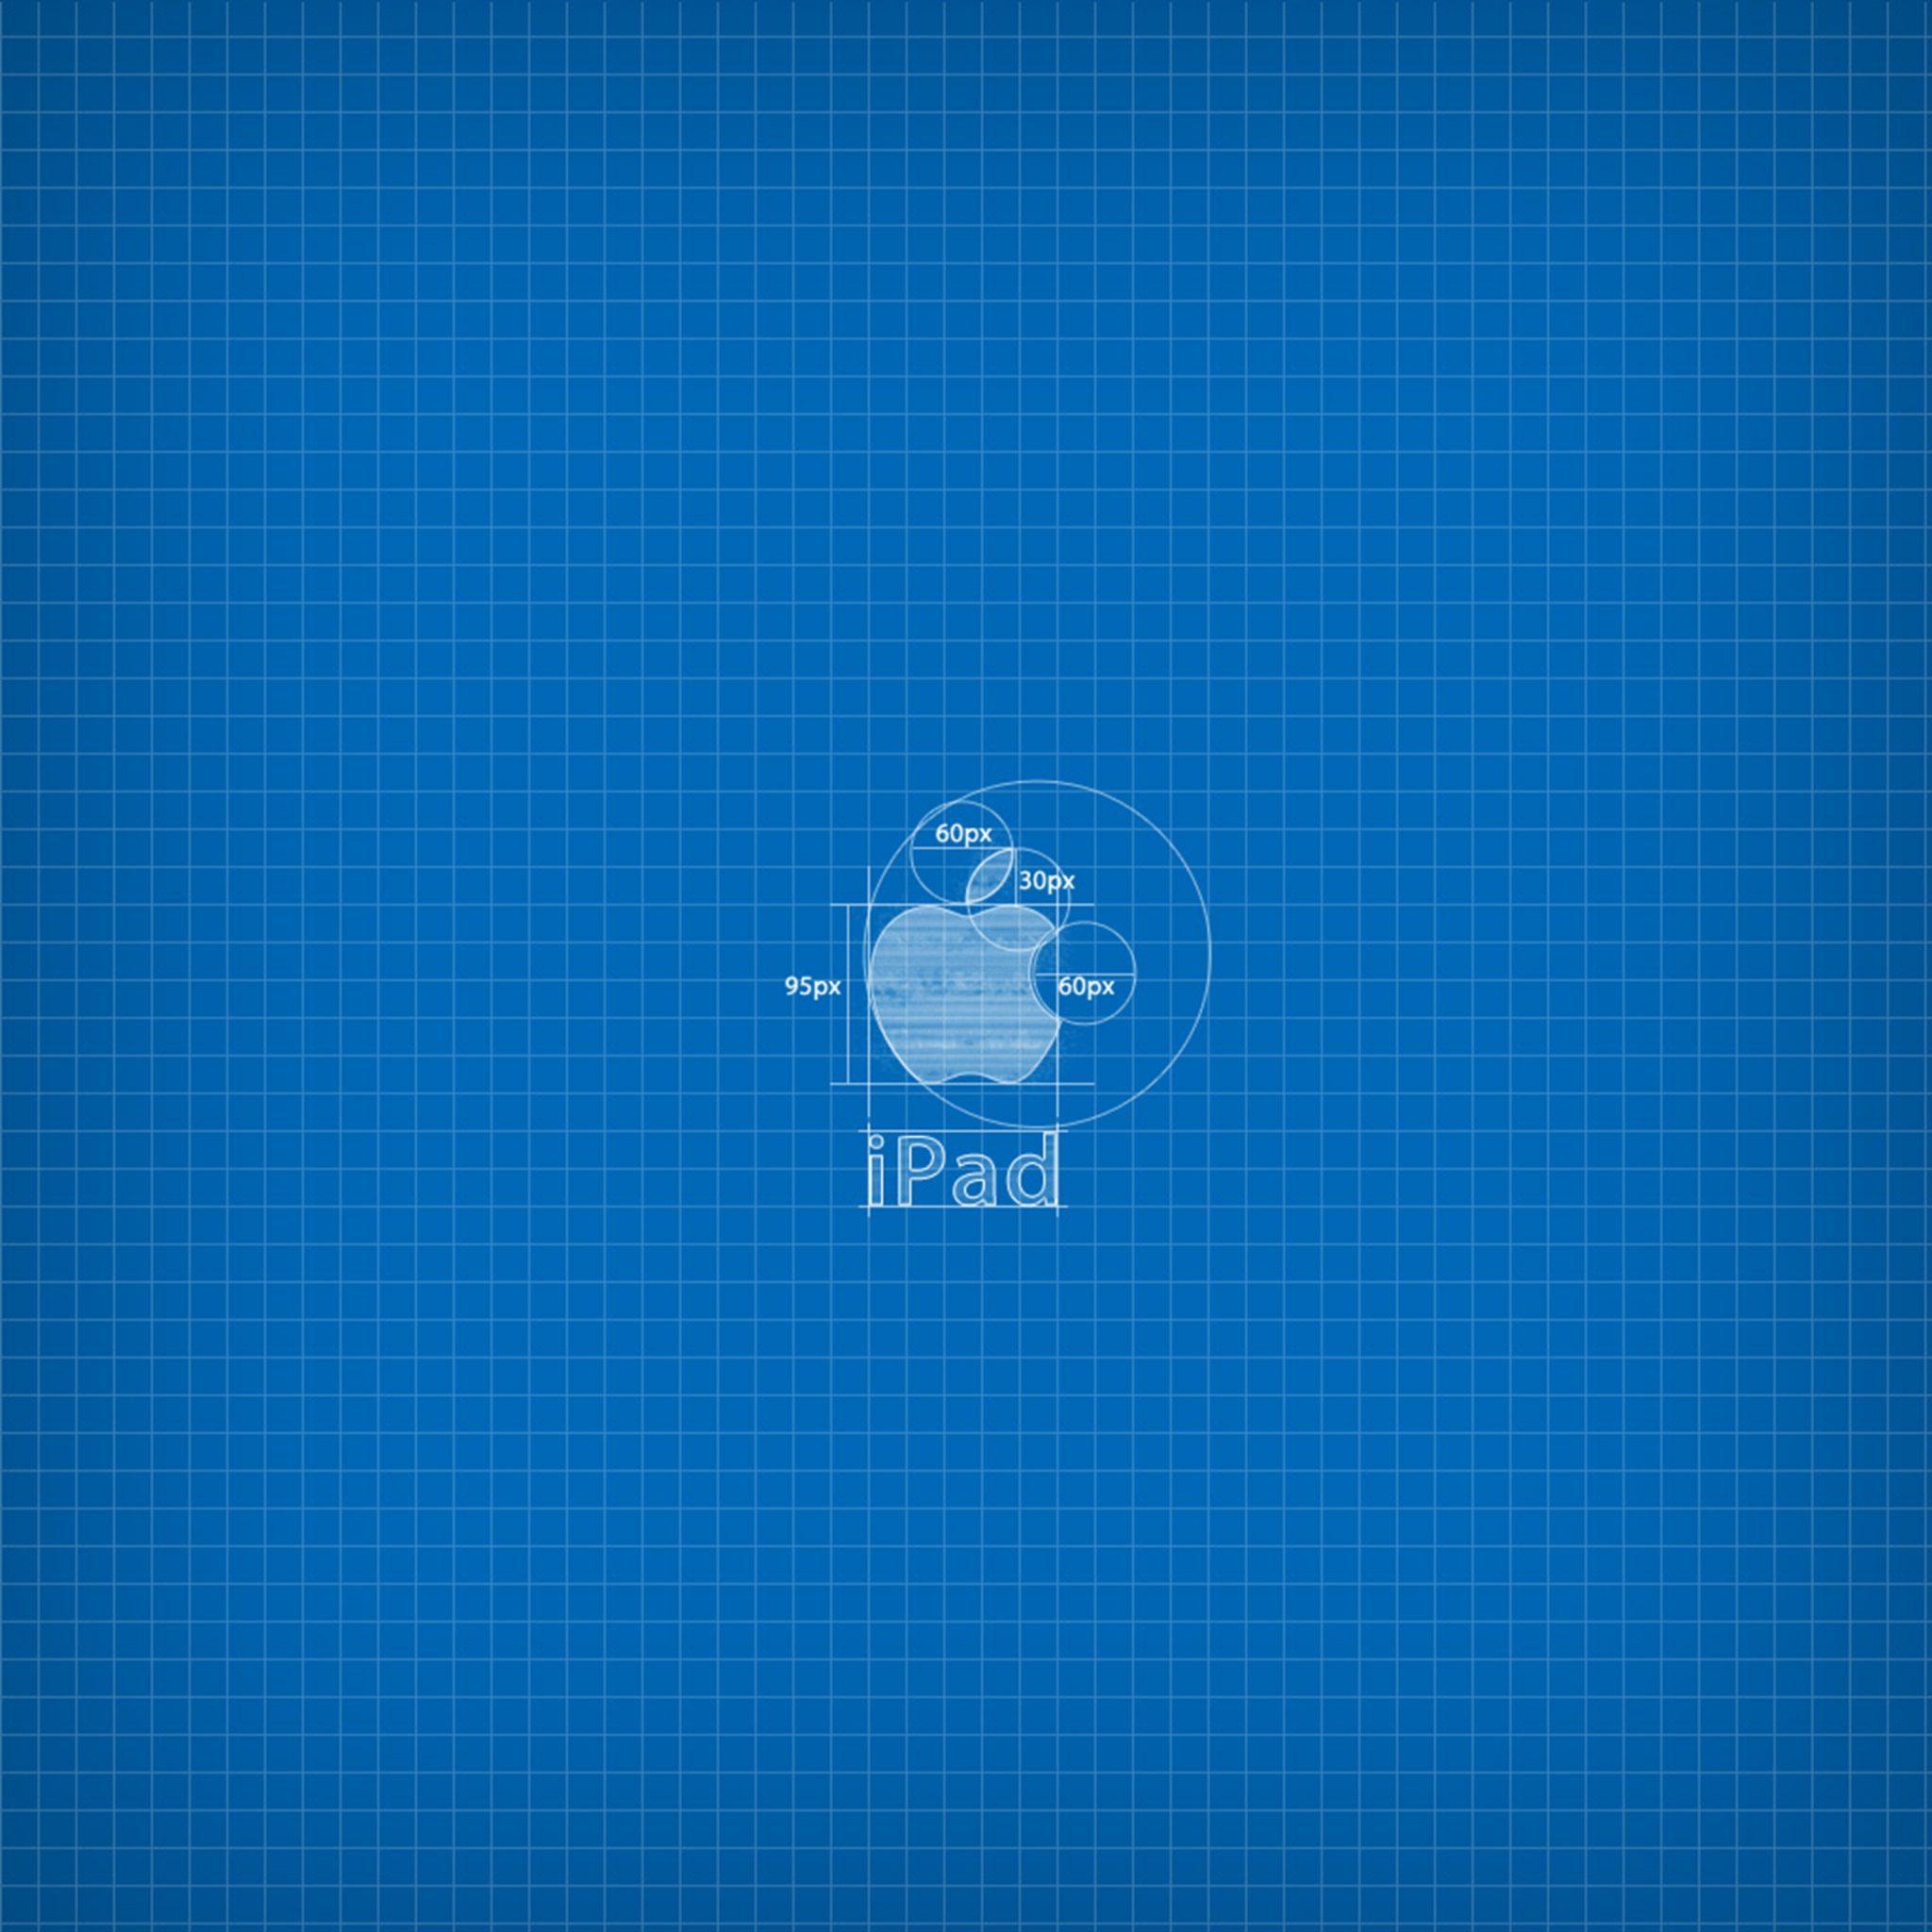 2048x2048 wallpapers iPad retina Apple Blueprint Ipad Wallpaper 2048x2048 pixels resolution